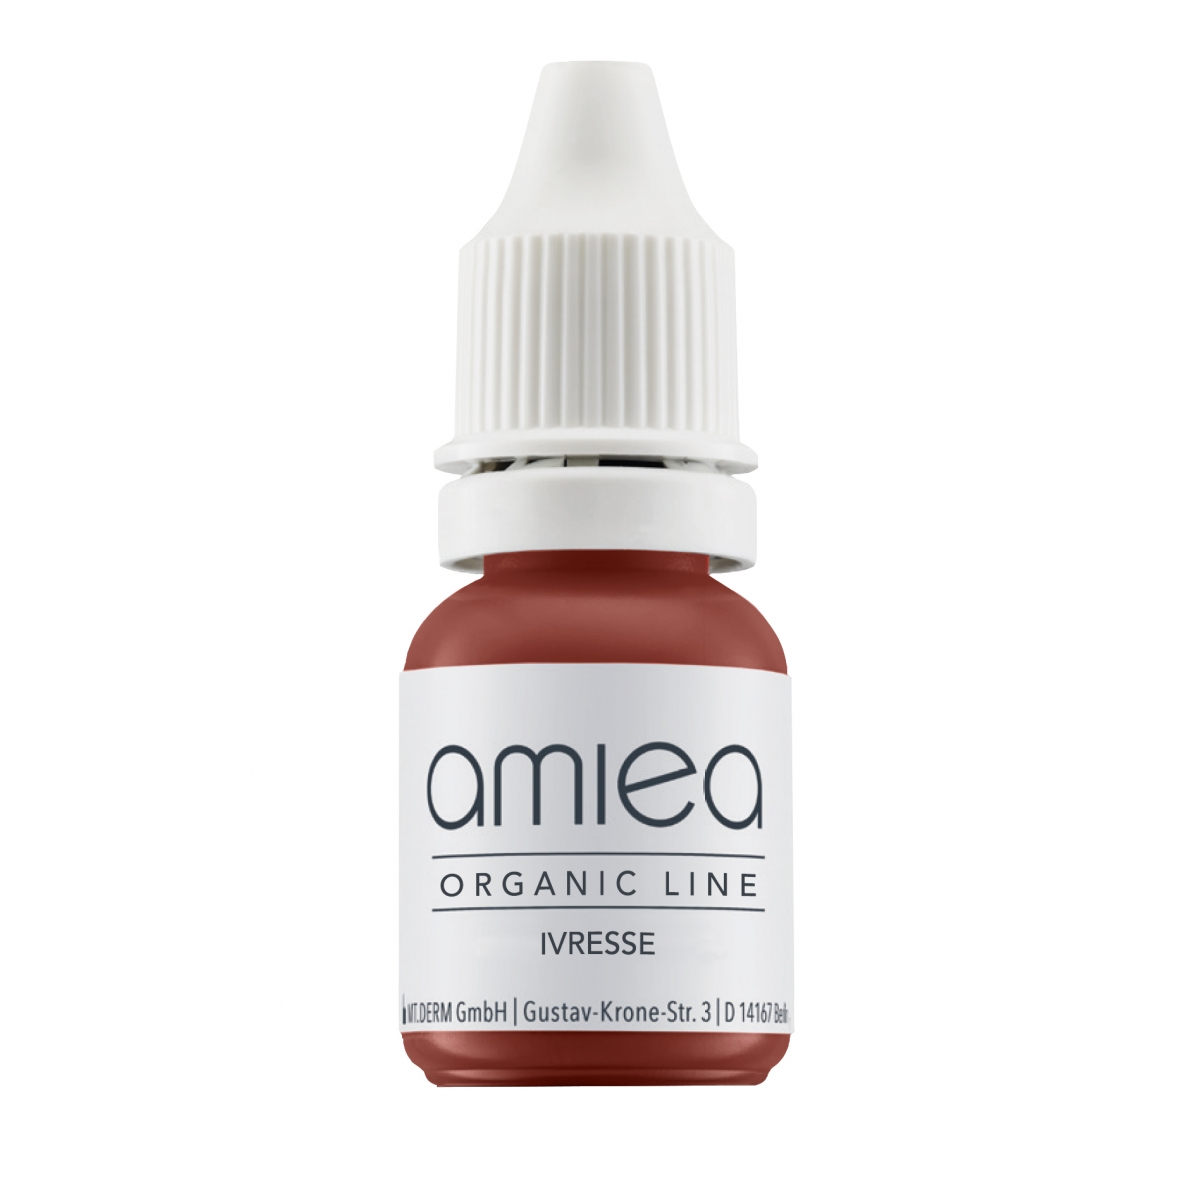 ORGANIC LINE (10ml) - PIGMENT IVRESSE ORGANICLINE AMIEA (10 ml)